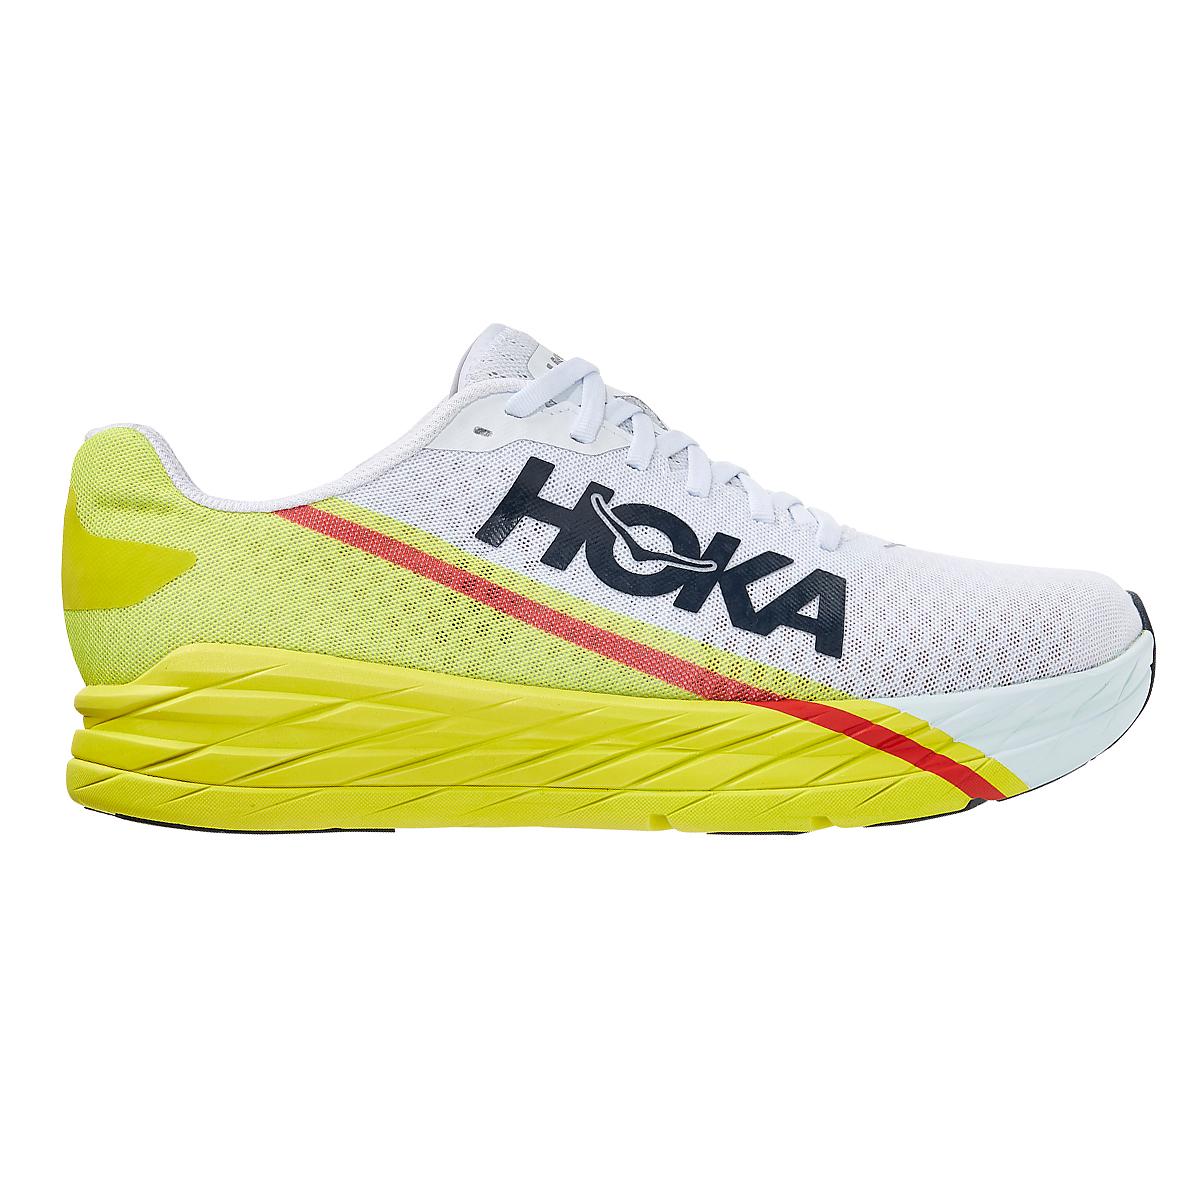 Men's Hoka One One Rocket X Running Shoe - Color: White/Evening Primrose - Size: 8.5 - Width: Regular, White/Evening Primrose, large, image 1